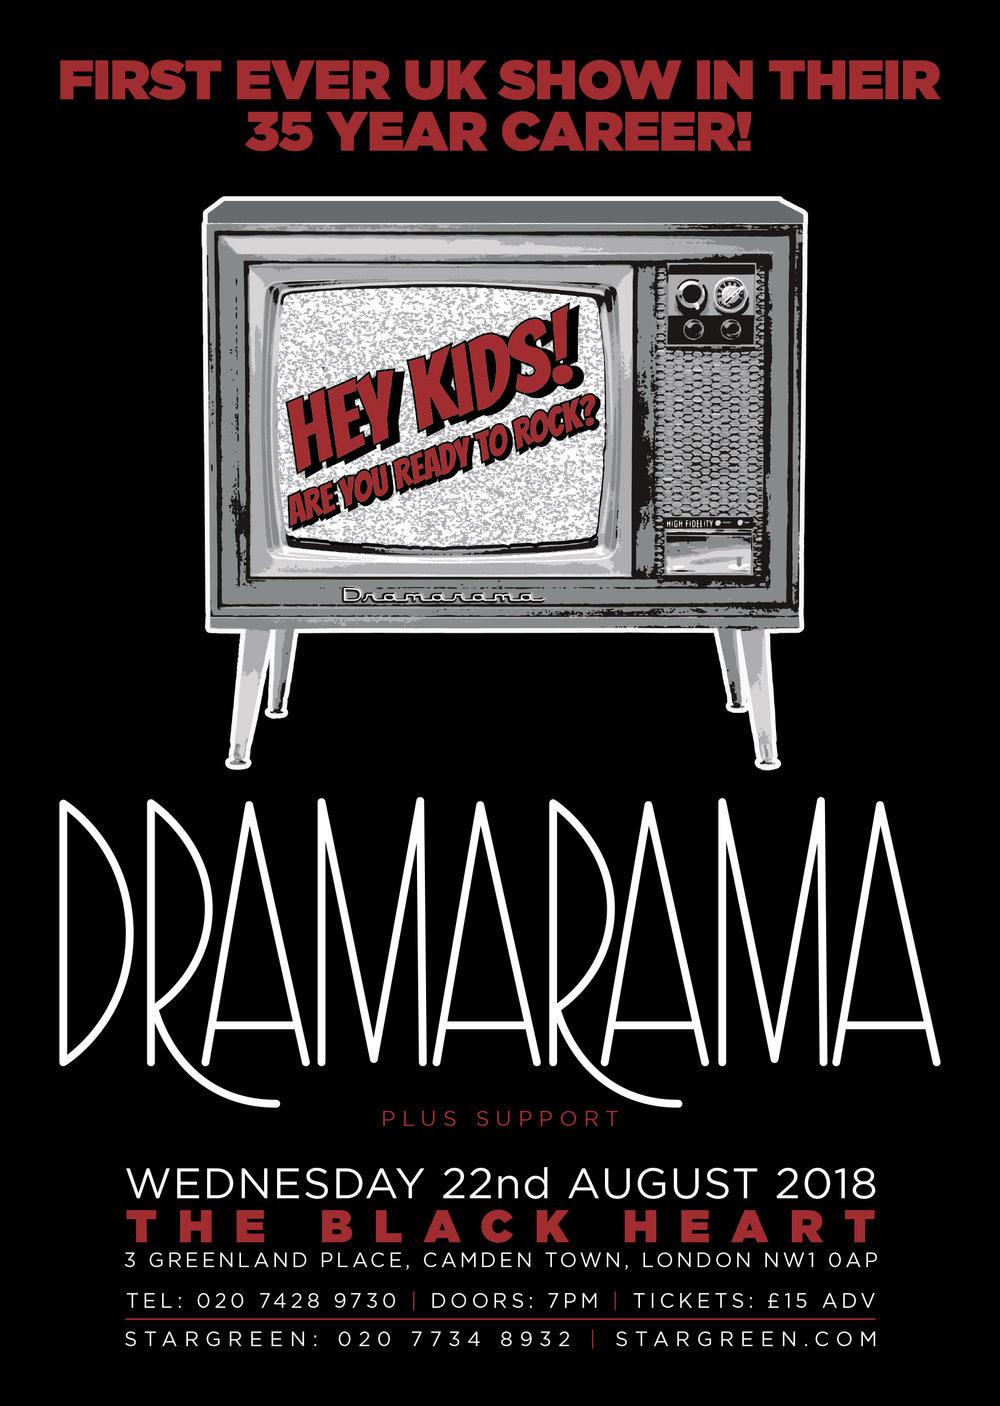 Dramarama-2018-A3-London-poster.jpg